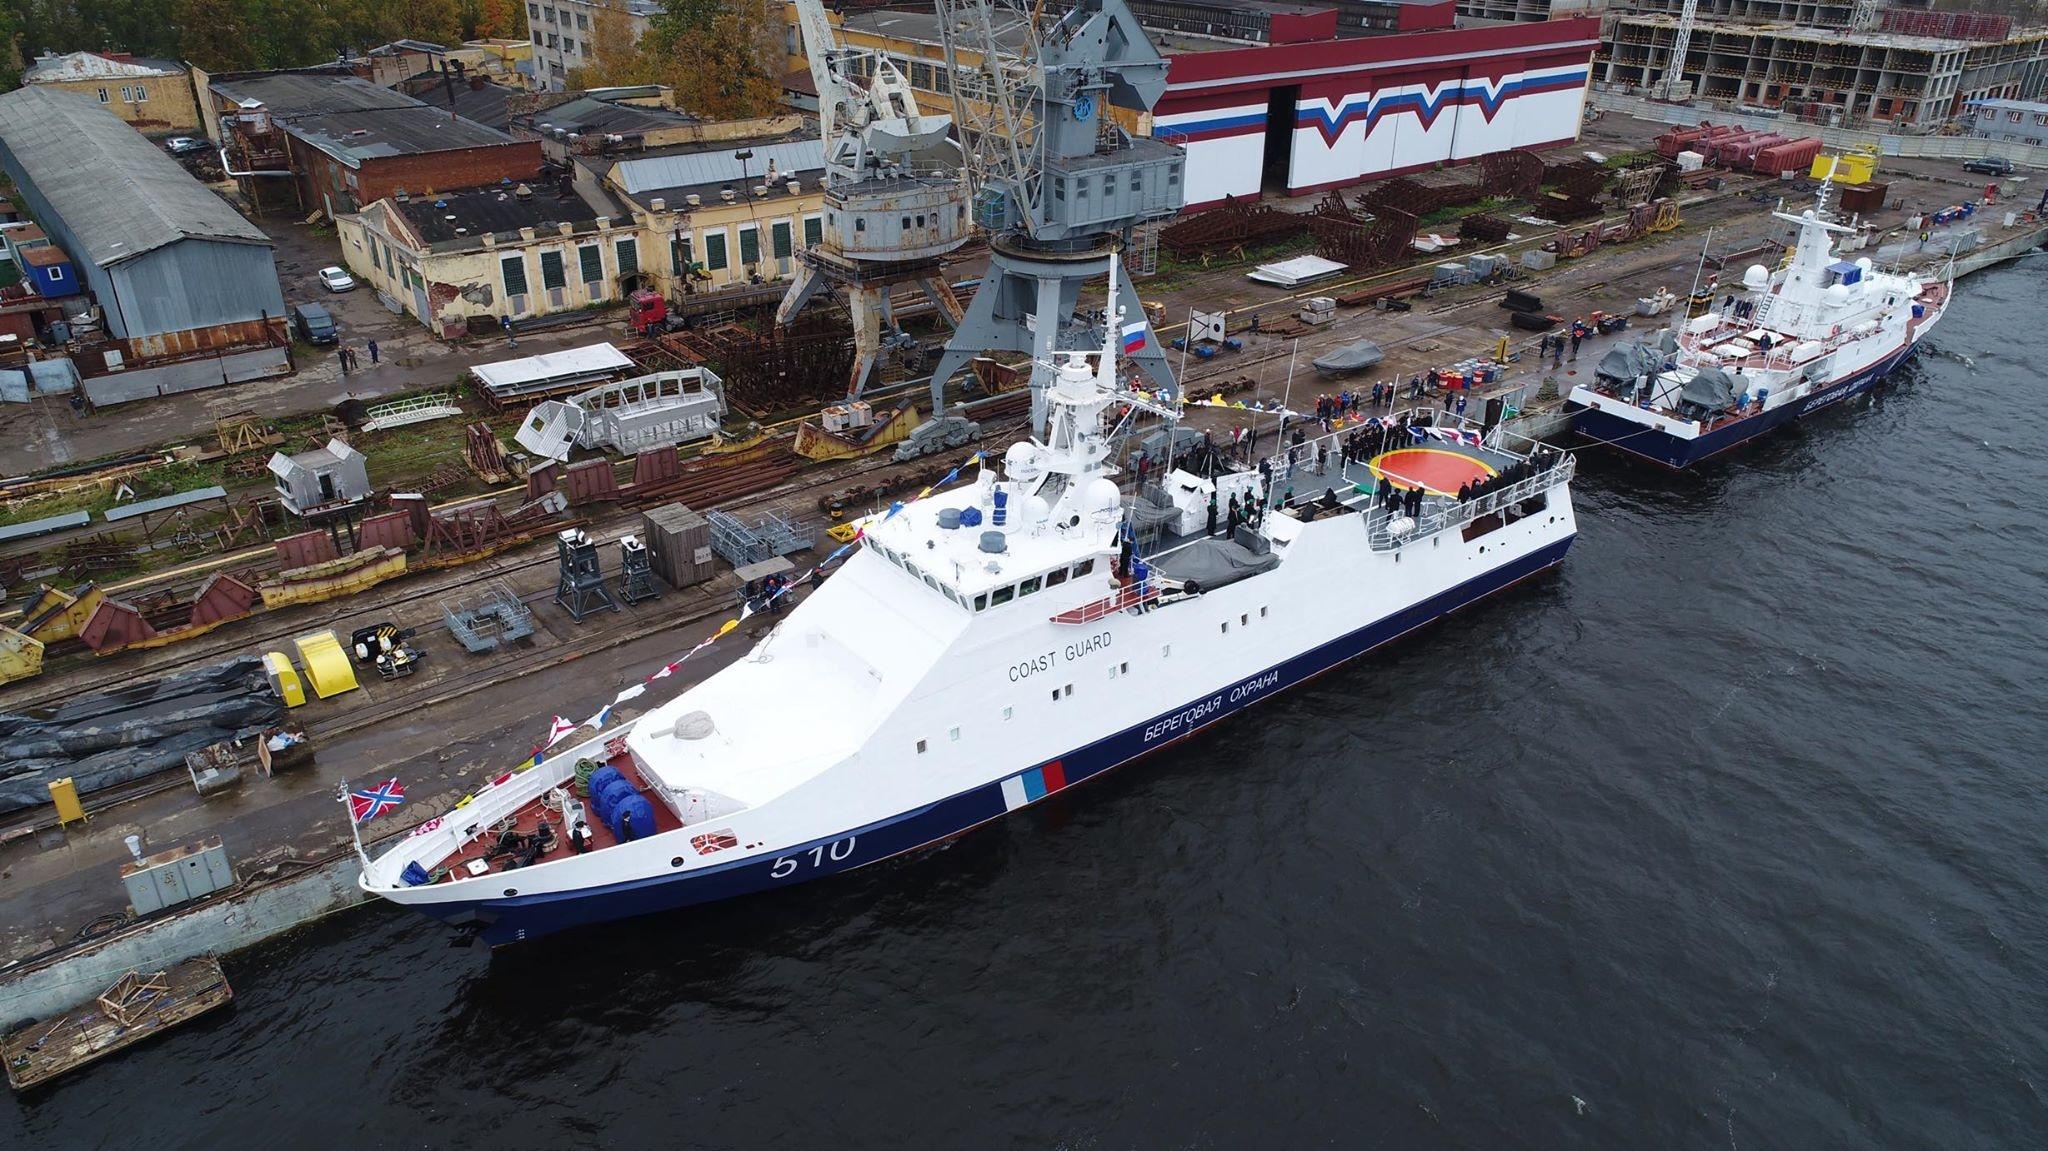 Border Service and Coast Guard of Russia - Page 5 F_YzIuc3RhdGljZmxpY2tyLmNvbS8yLzE5NzcvNDM0MTE0NDExNzBfOTdiMzIwZDliN19vLmpwZz9fX2lkPTExMjg4OA==